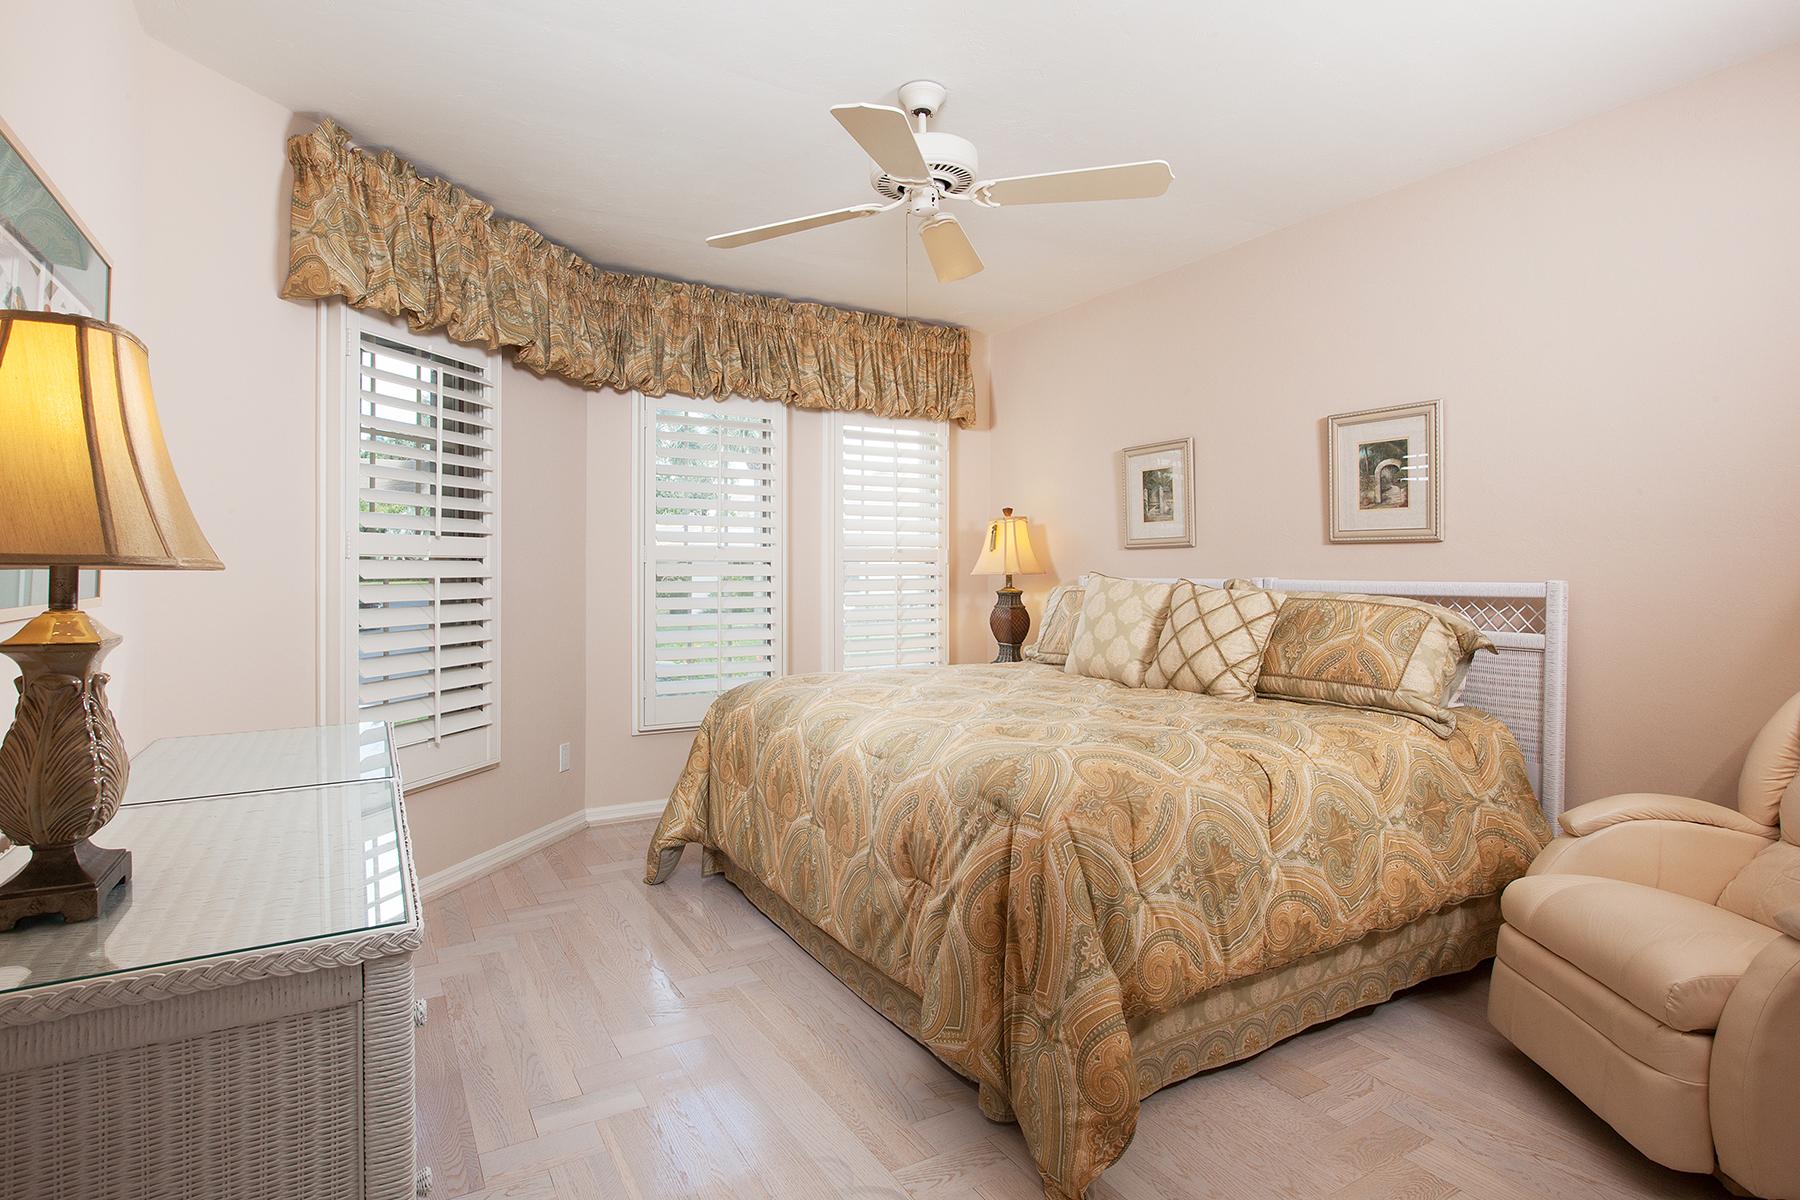 Additional photo for property listing at BONITA BAY - ENCLAVE 27100  Enclave Dr,  Bonita Springs, Florida 34134 United States